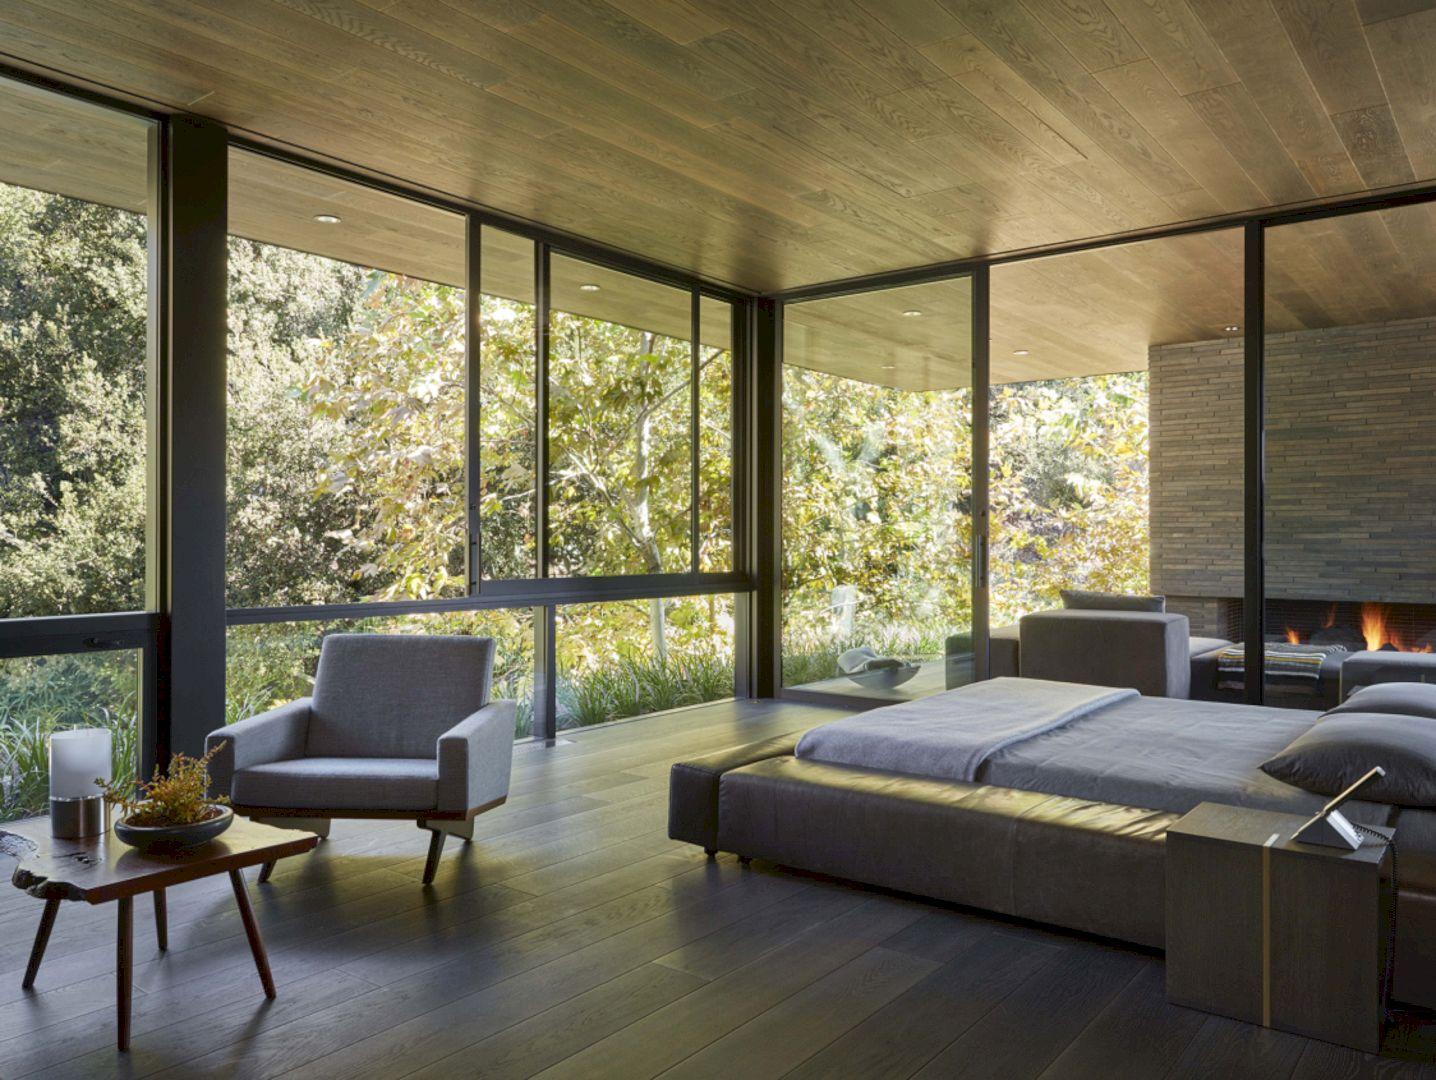 Mandeville Canyon By Marmol Radziner Architecture 9